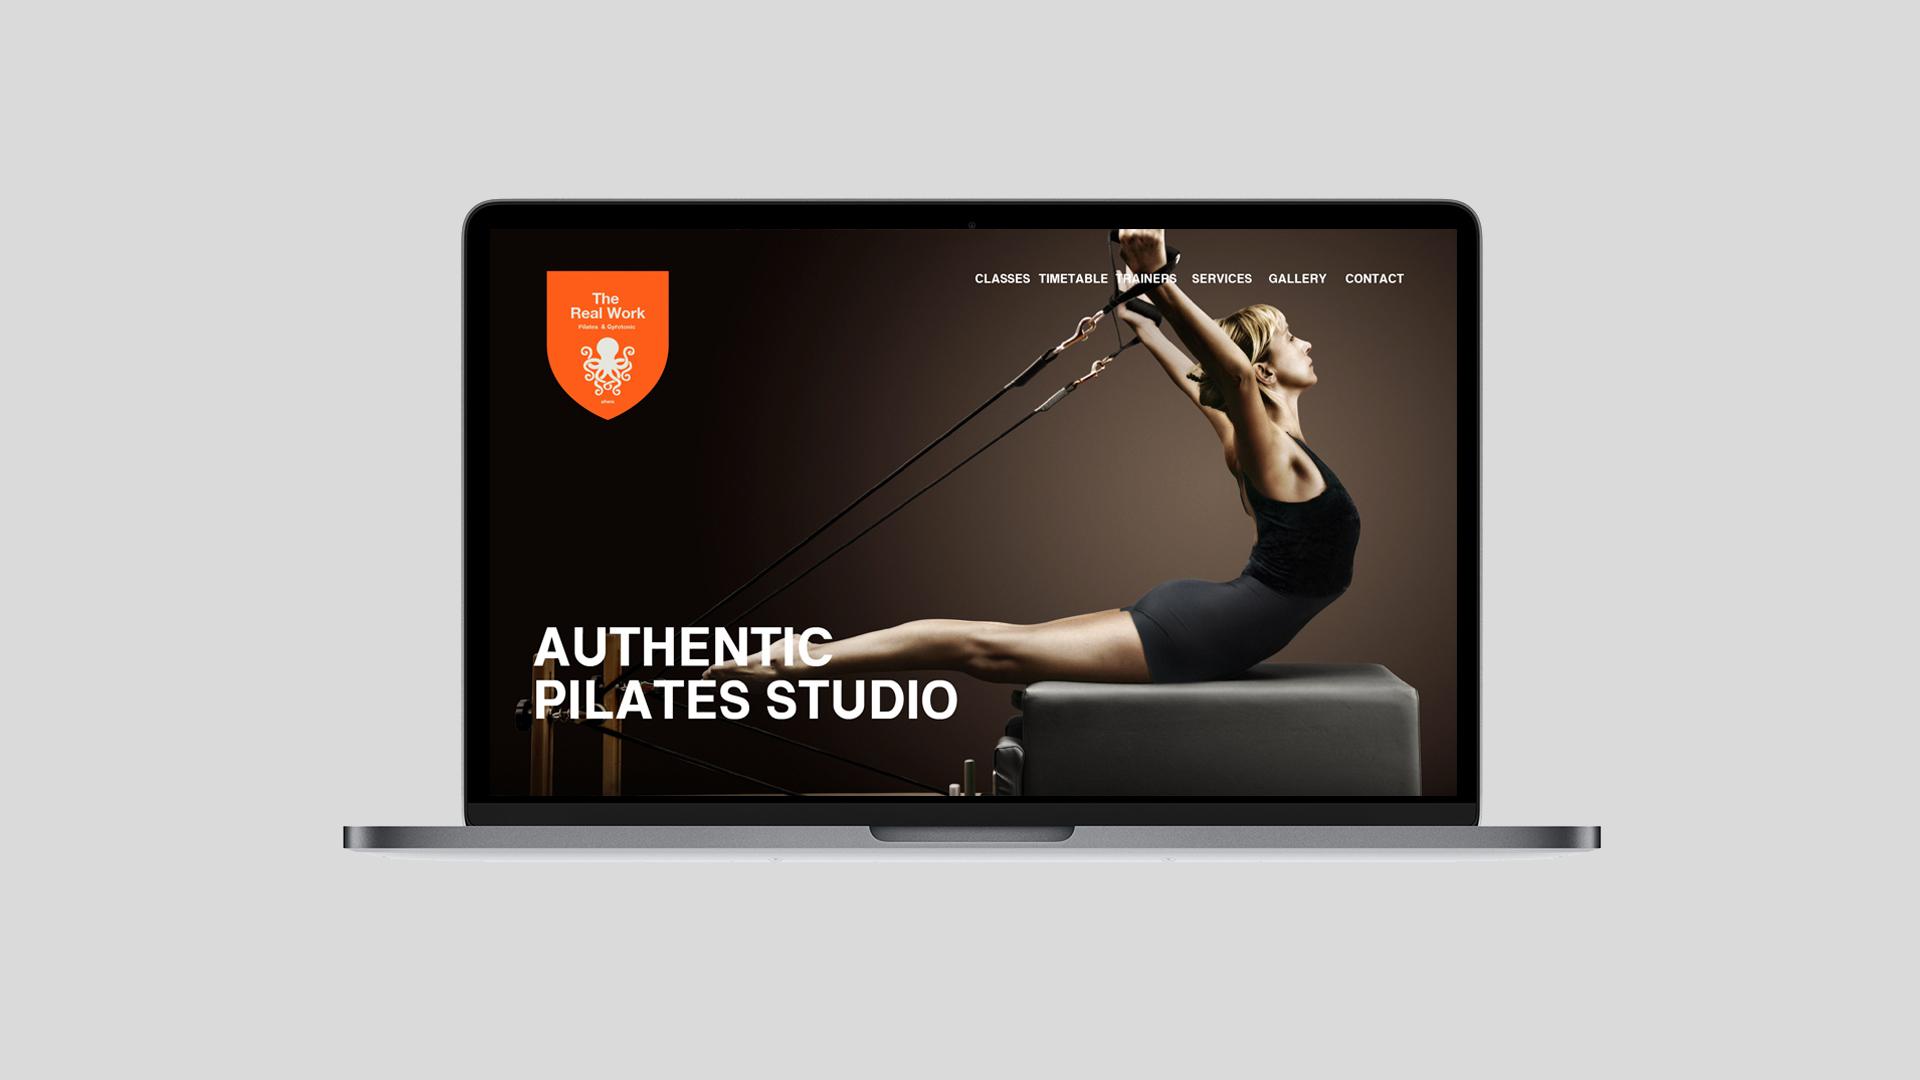 designpark_the_real_work_website